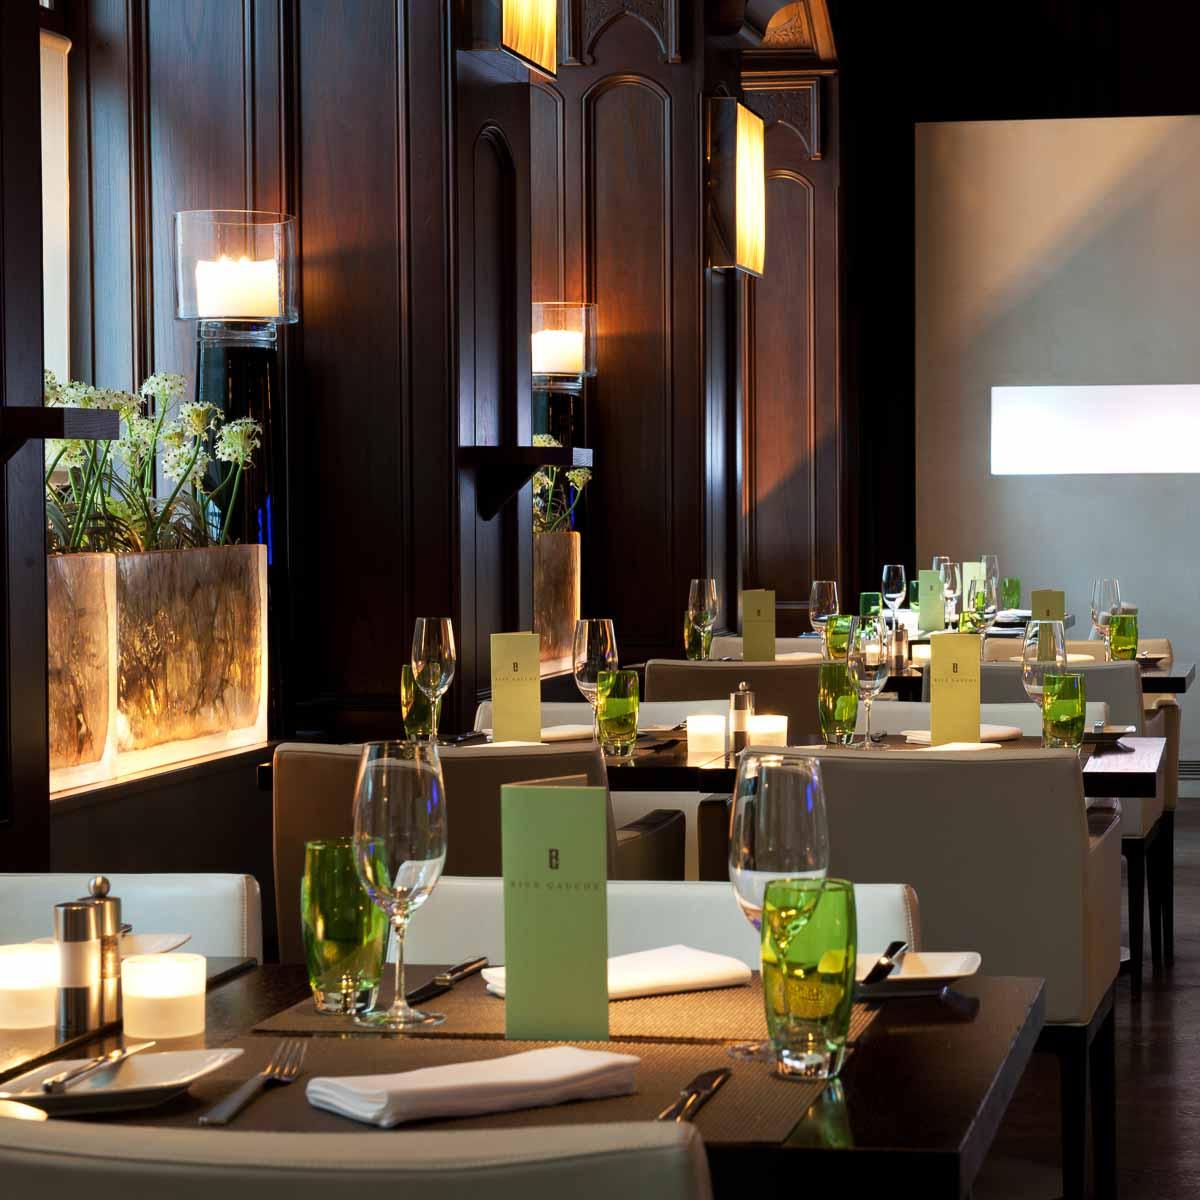 Restaurant Rive Gauche im Hotel Baur au Lac Zürich-5